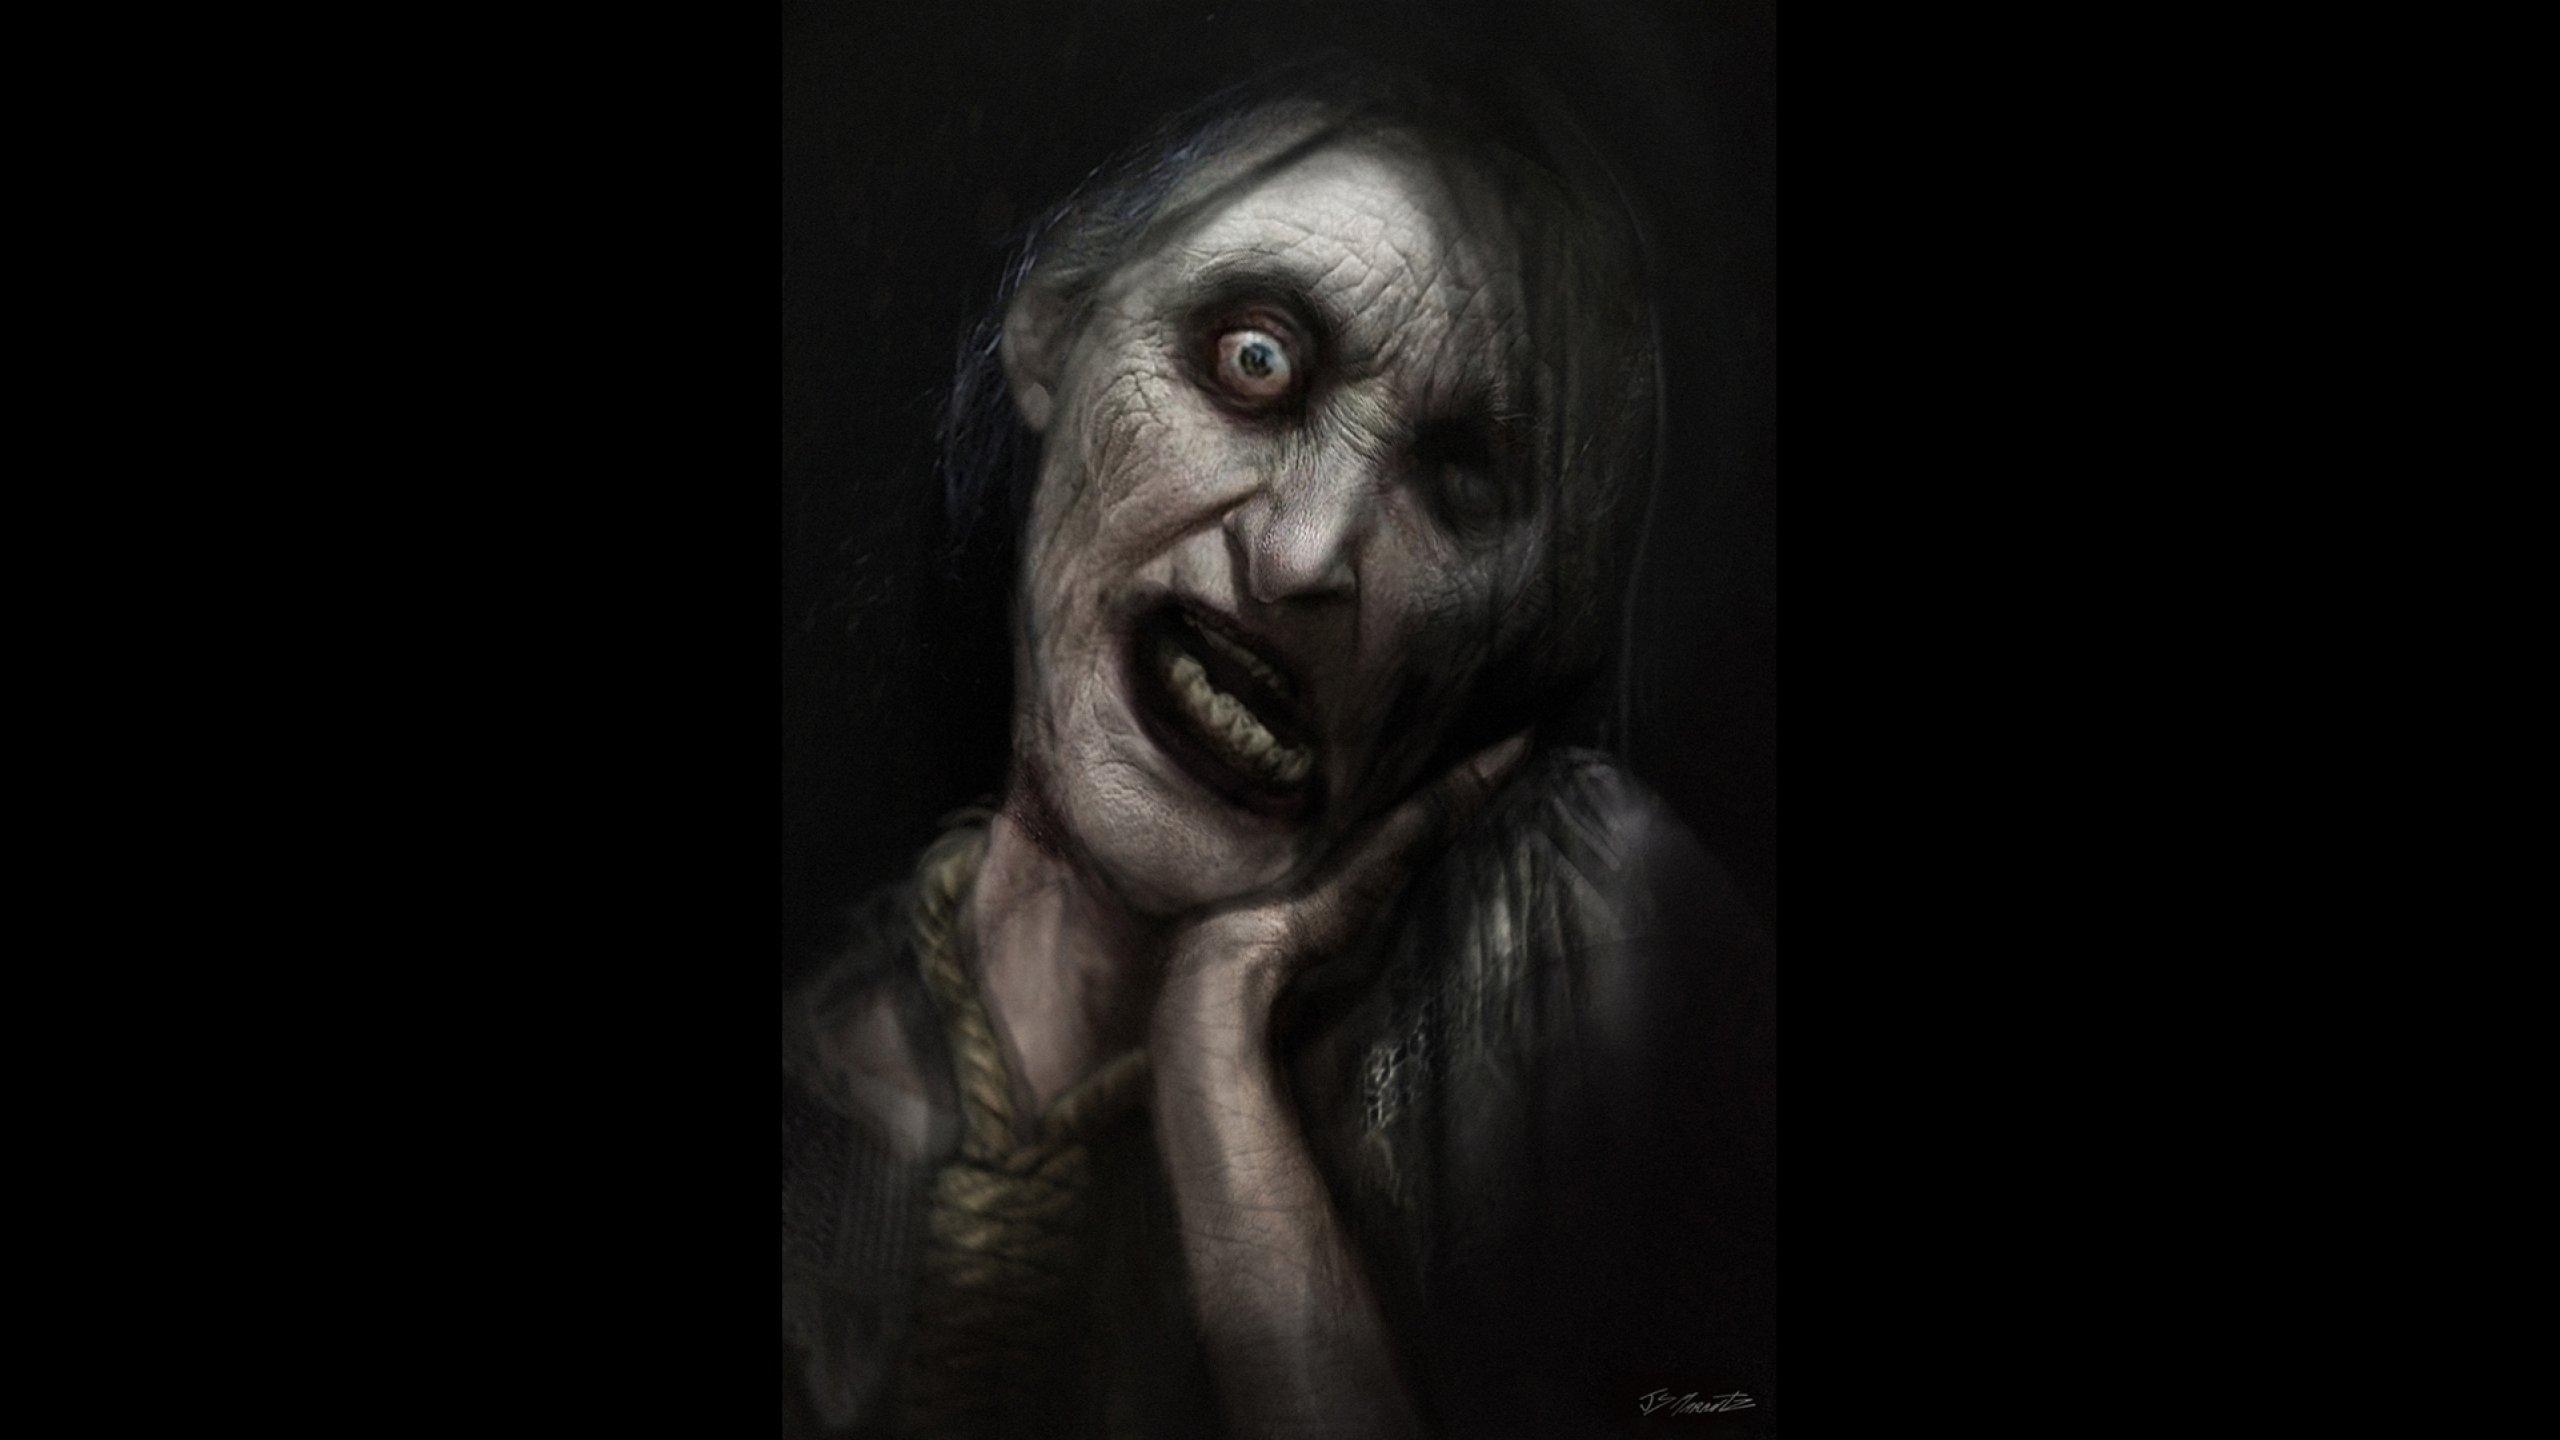 nurse 3d full horror movie download